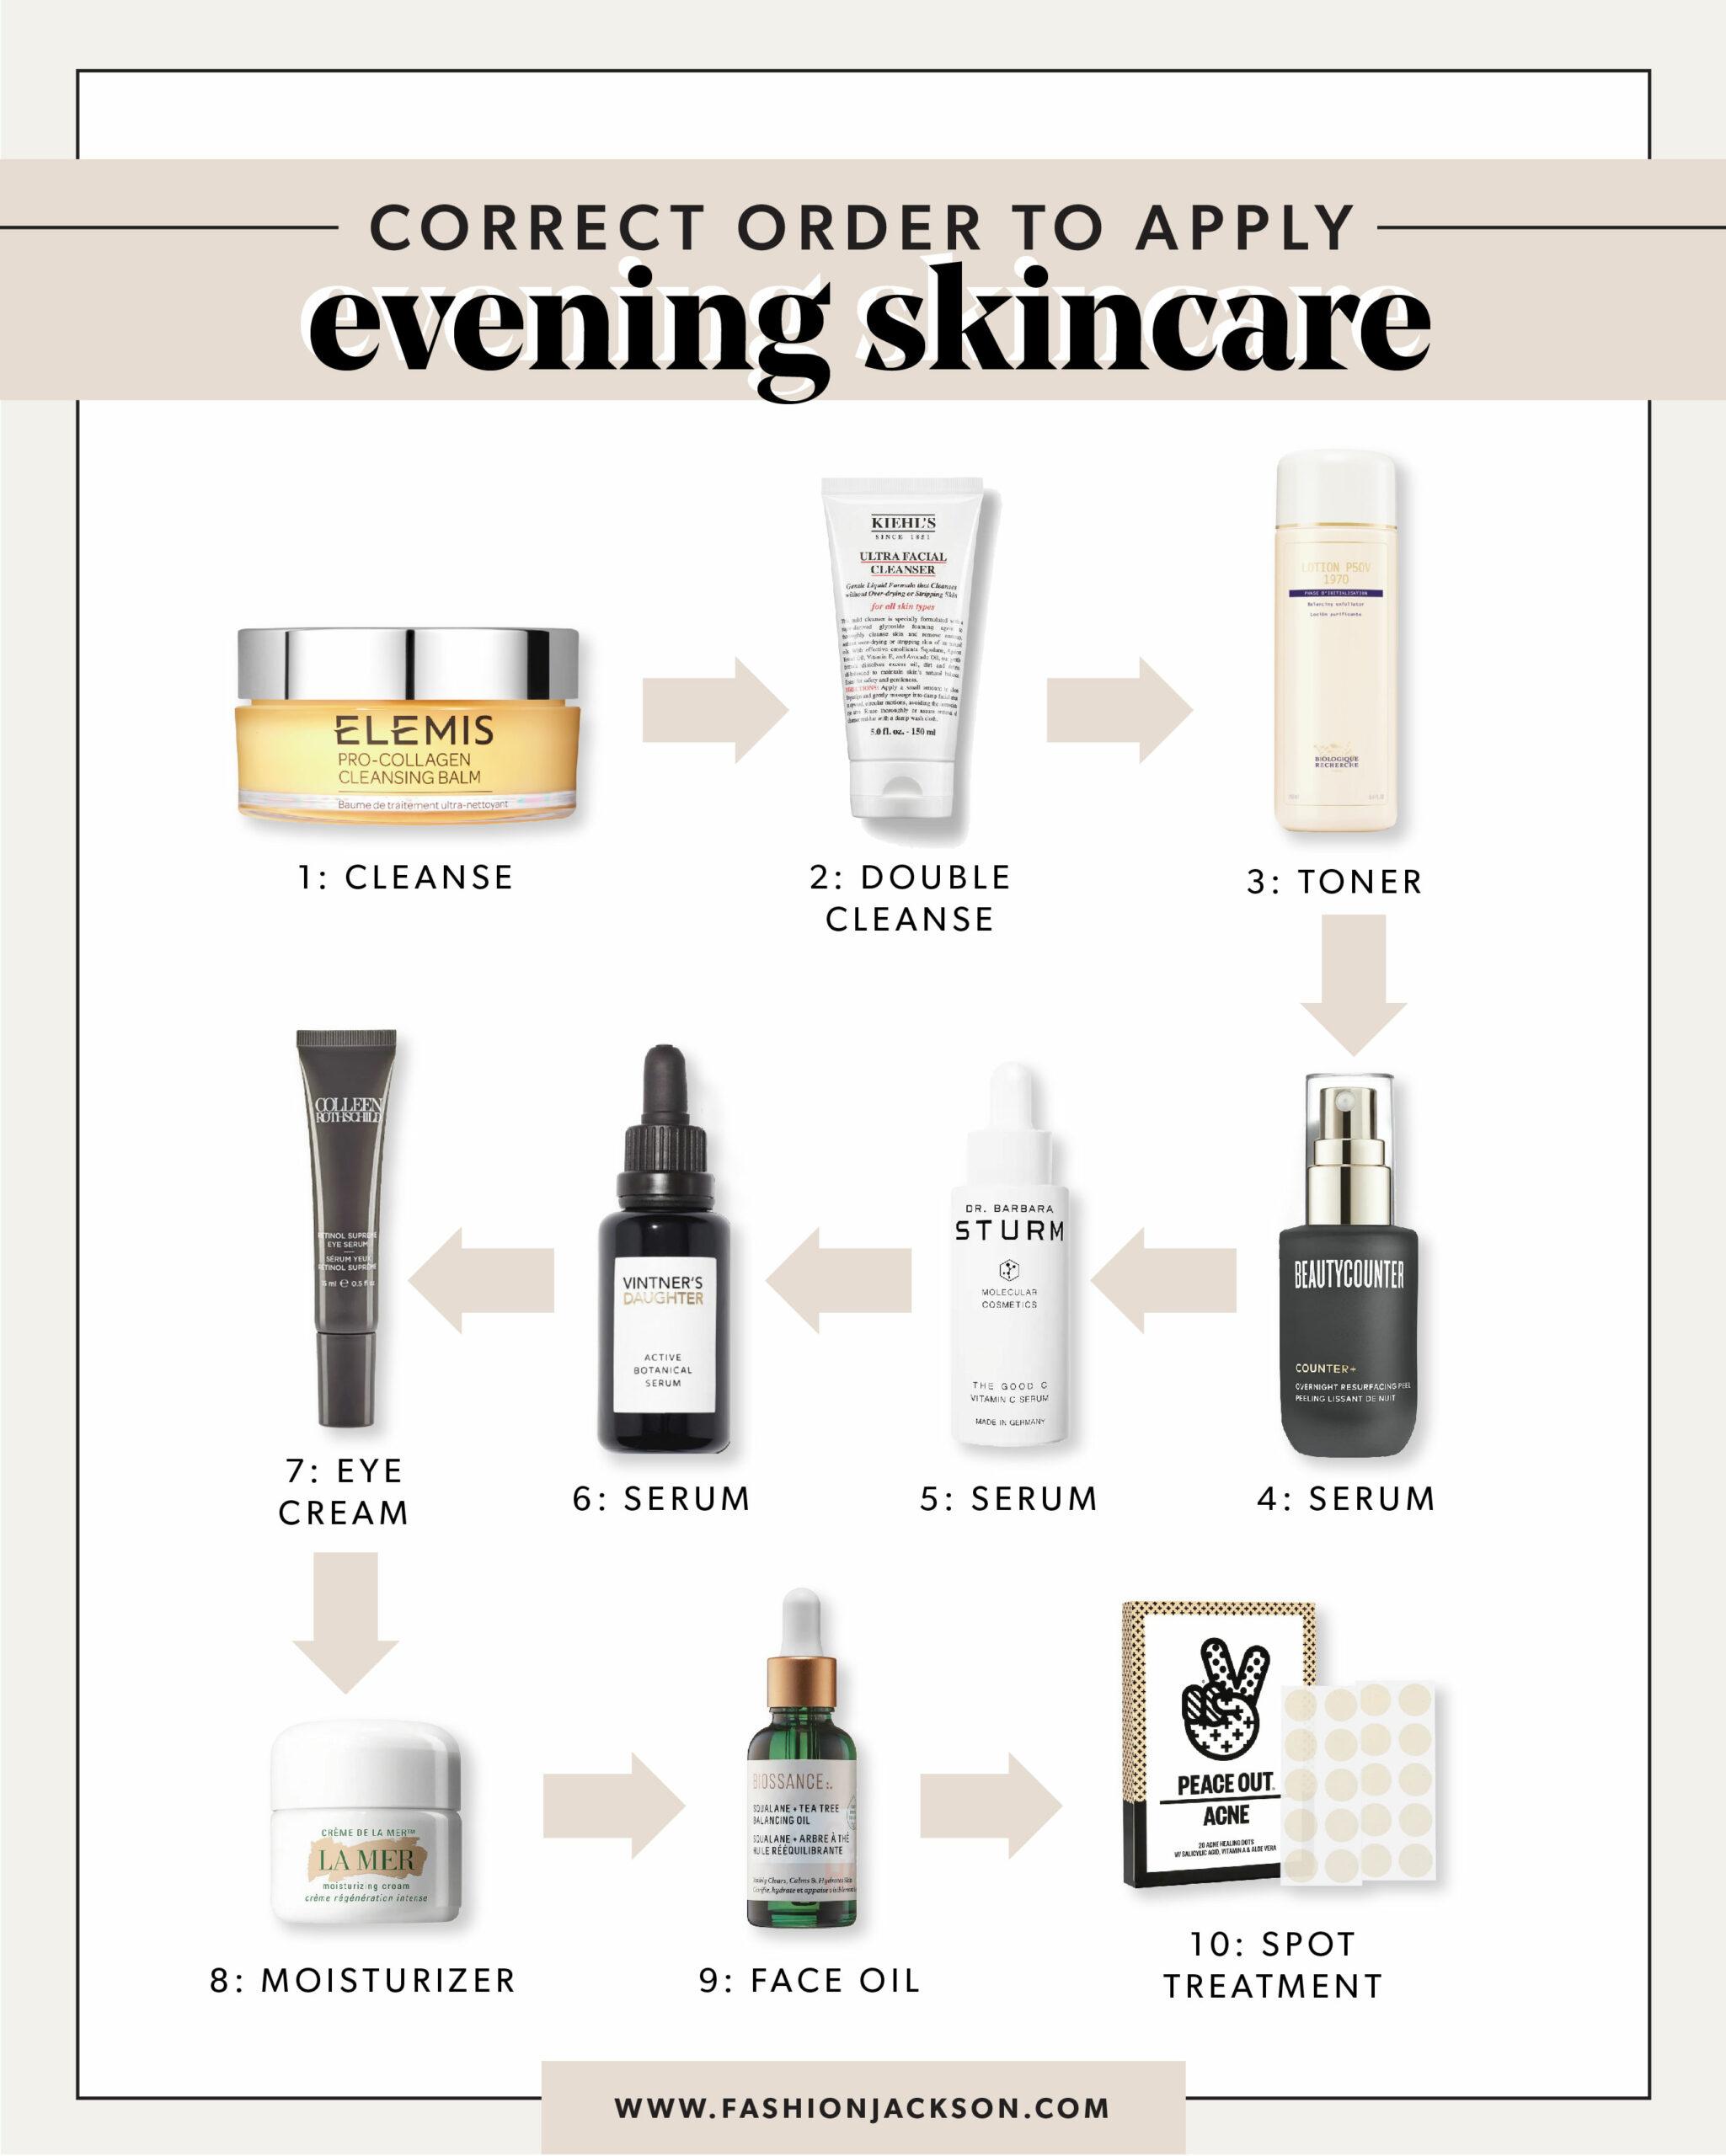 fashion jackson correct order to apply skincare evening routine